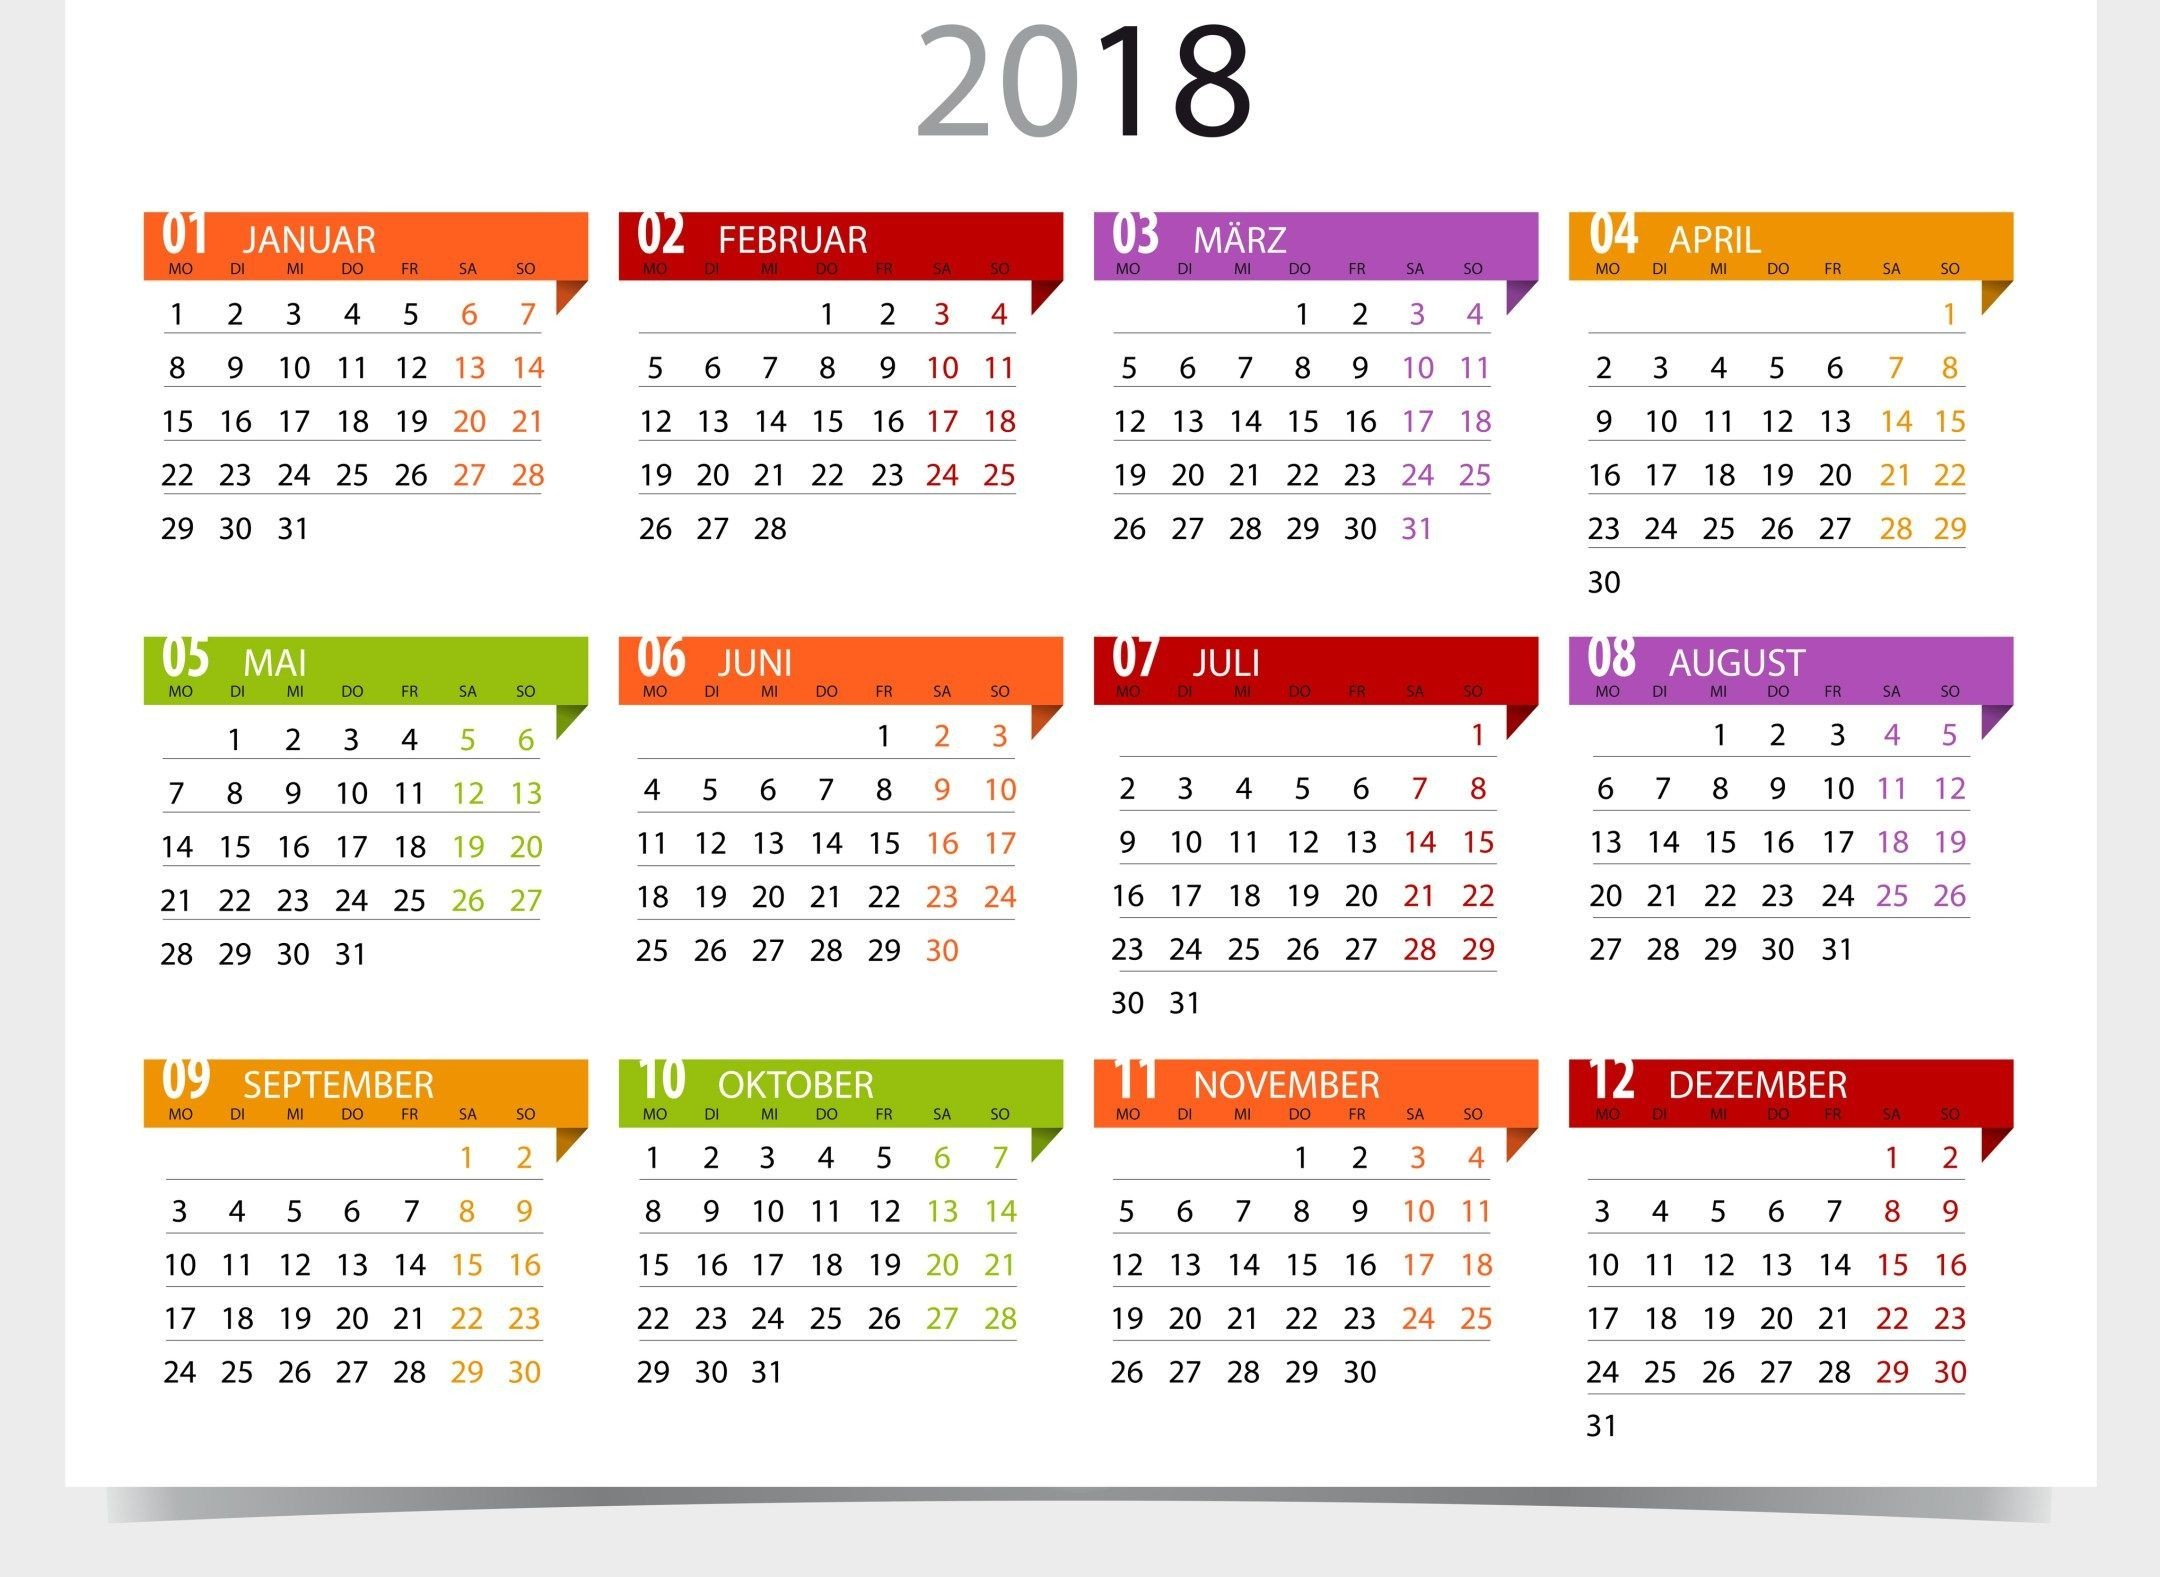 Calendario Para Imprimir 2019 Con Fotos Más Recientes Es Calendarios Para Imprimir 2017 Noviembre Of Calendario Para Imprimir 2019 Con Fotos Actual Printable 2019 Hd Wall Calendar